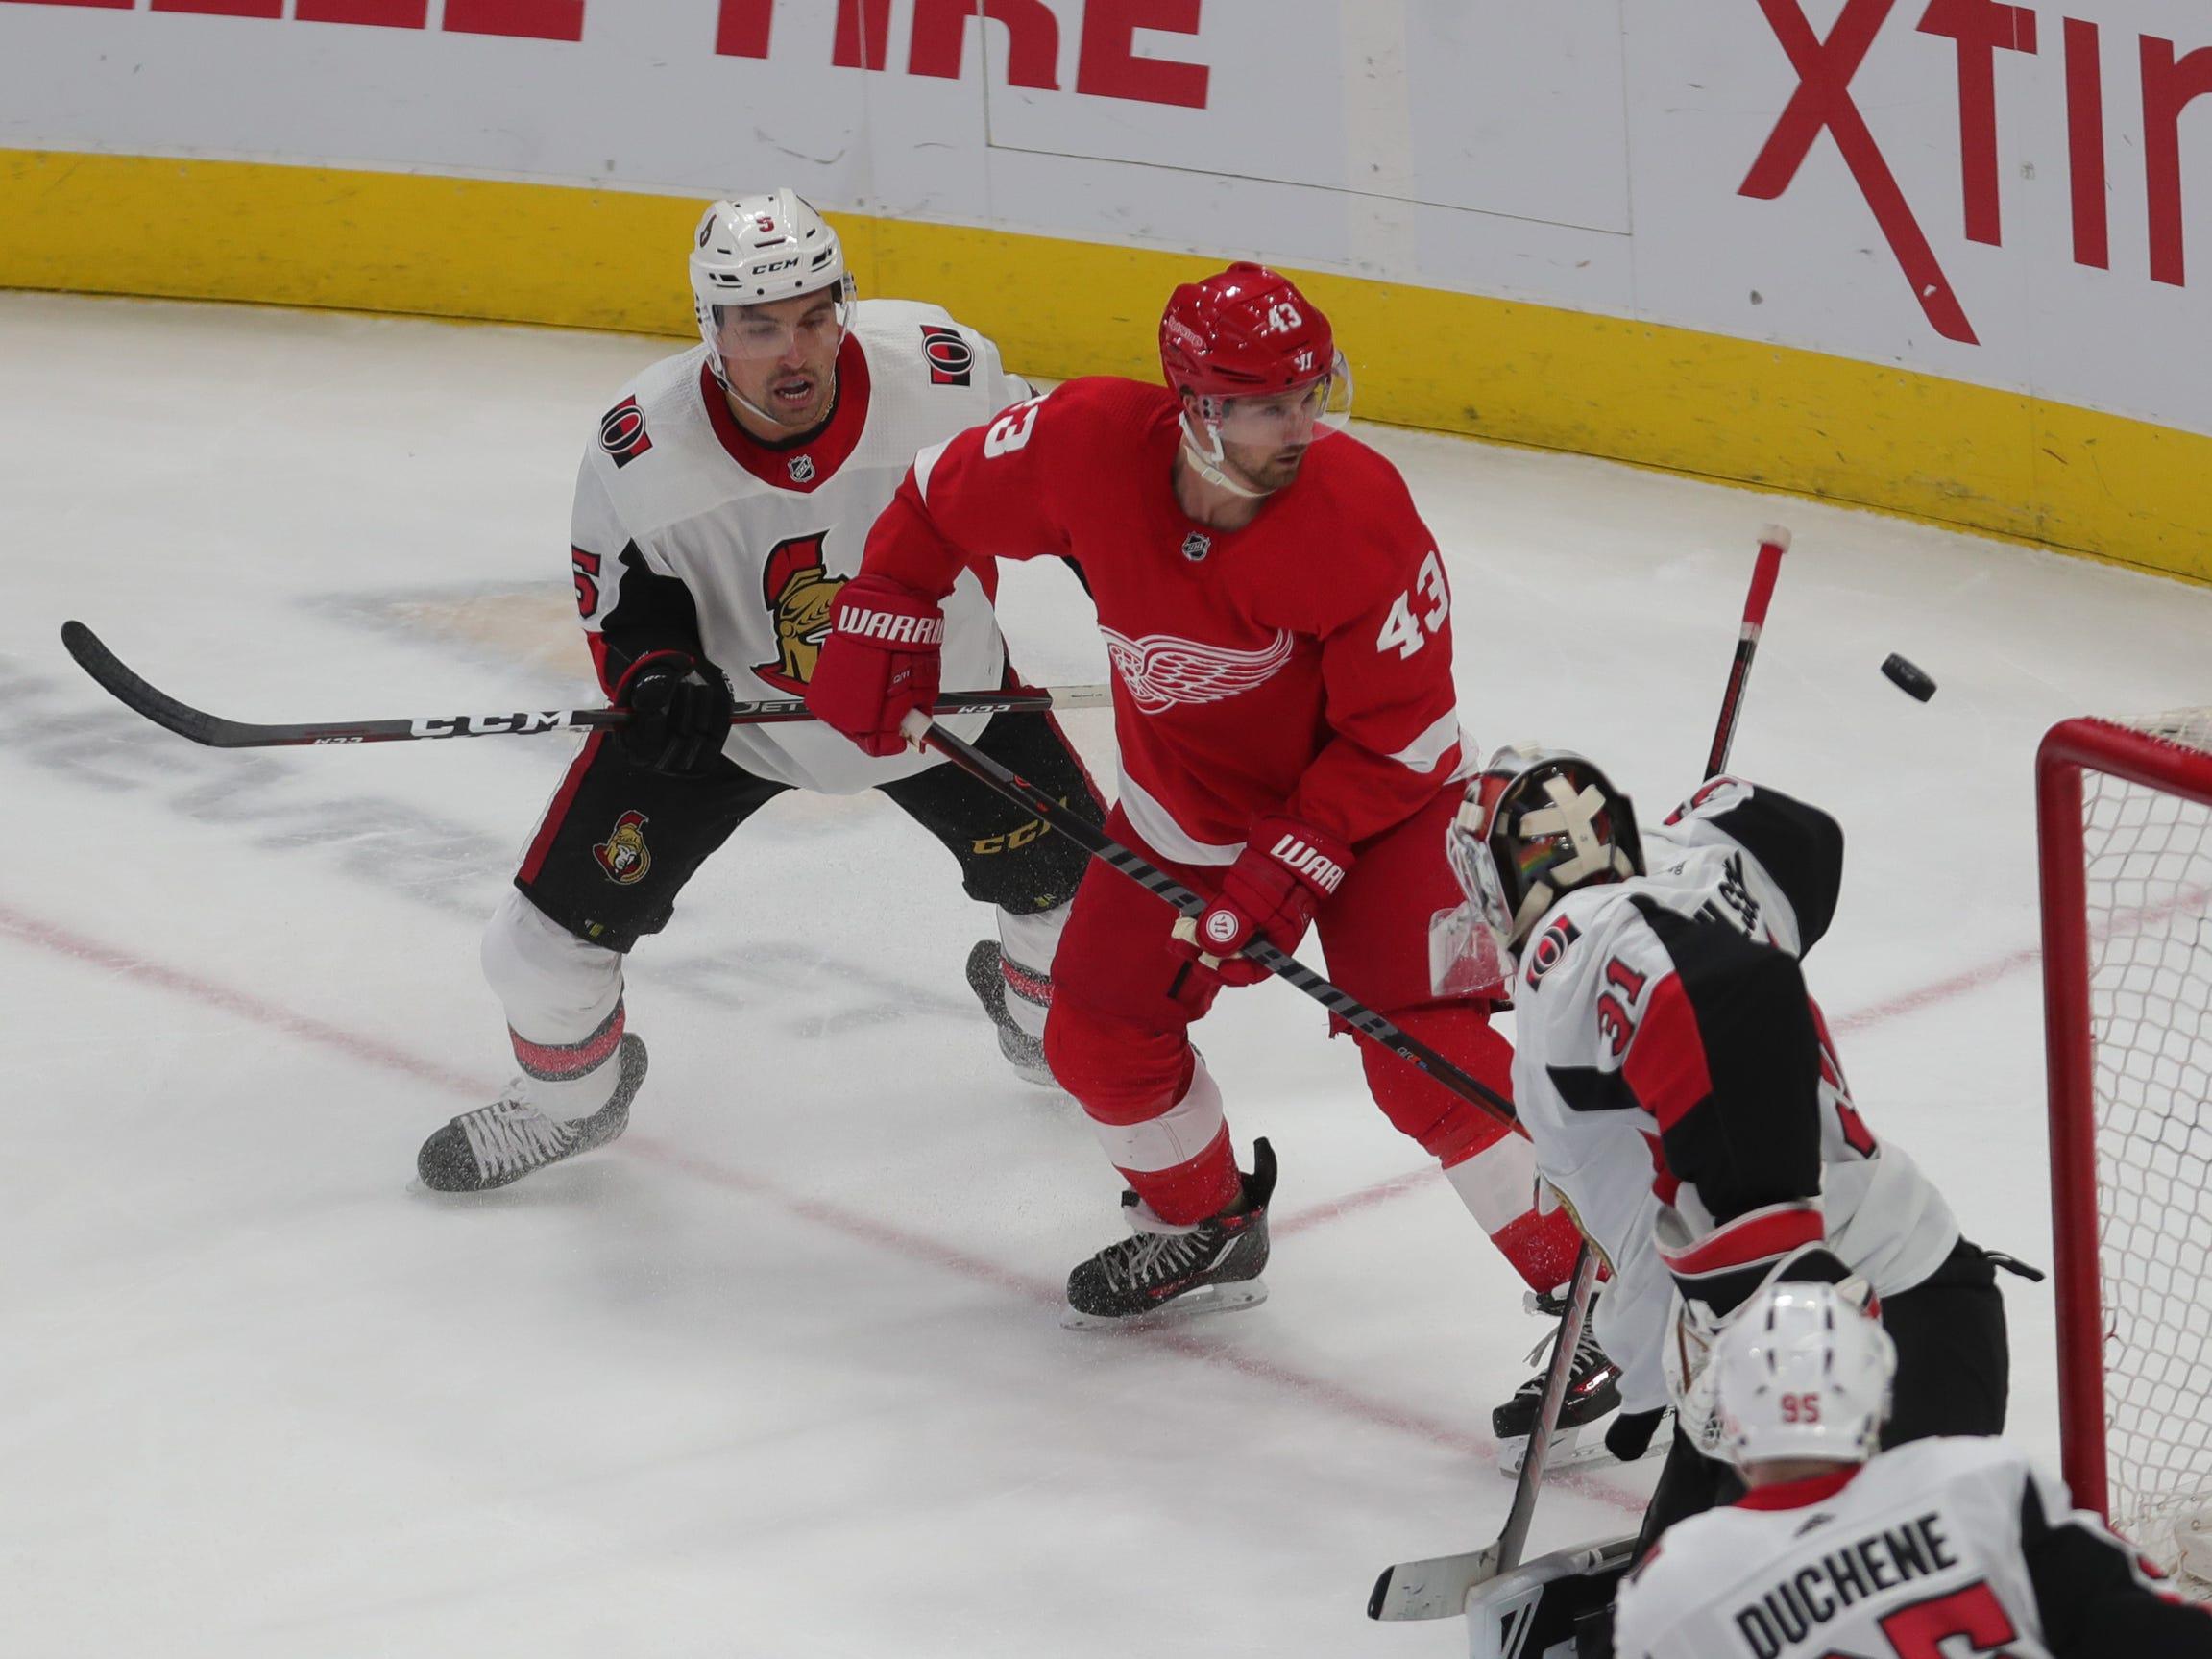 Red Wings forward Darren Helm shoots against Senators goalie Anders Nilsson on Feb. 14, 2019 at Little Caesars Arena in Detroit.